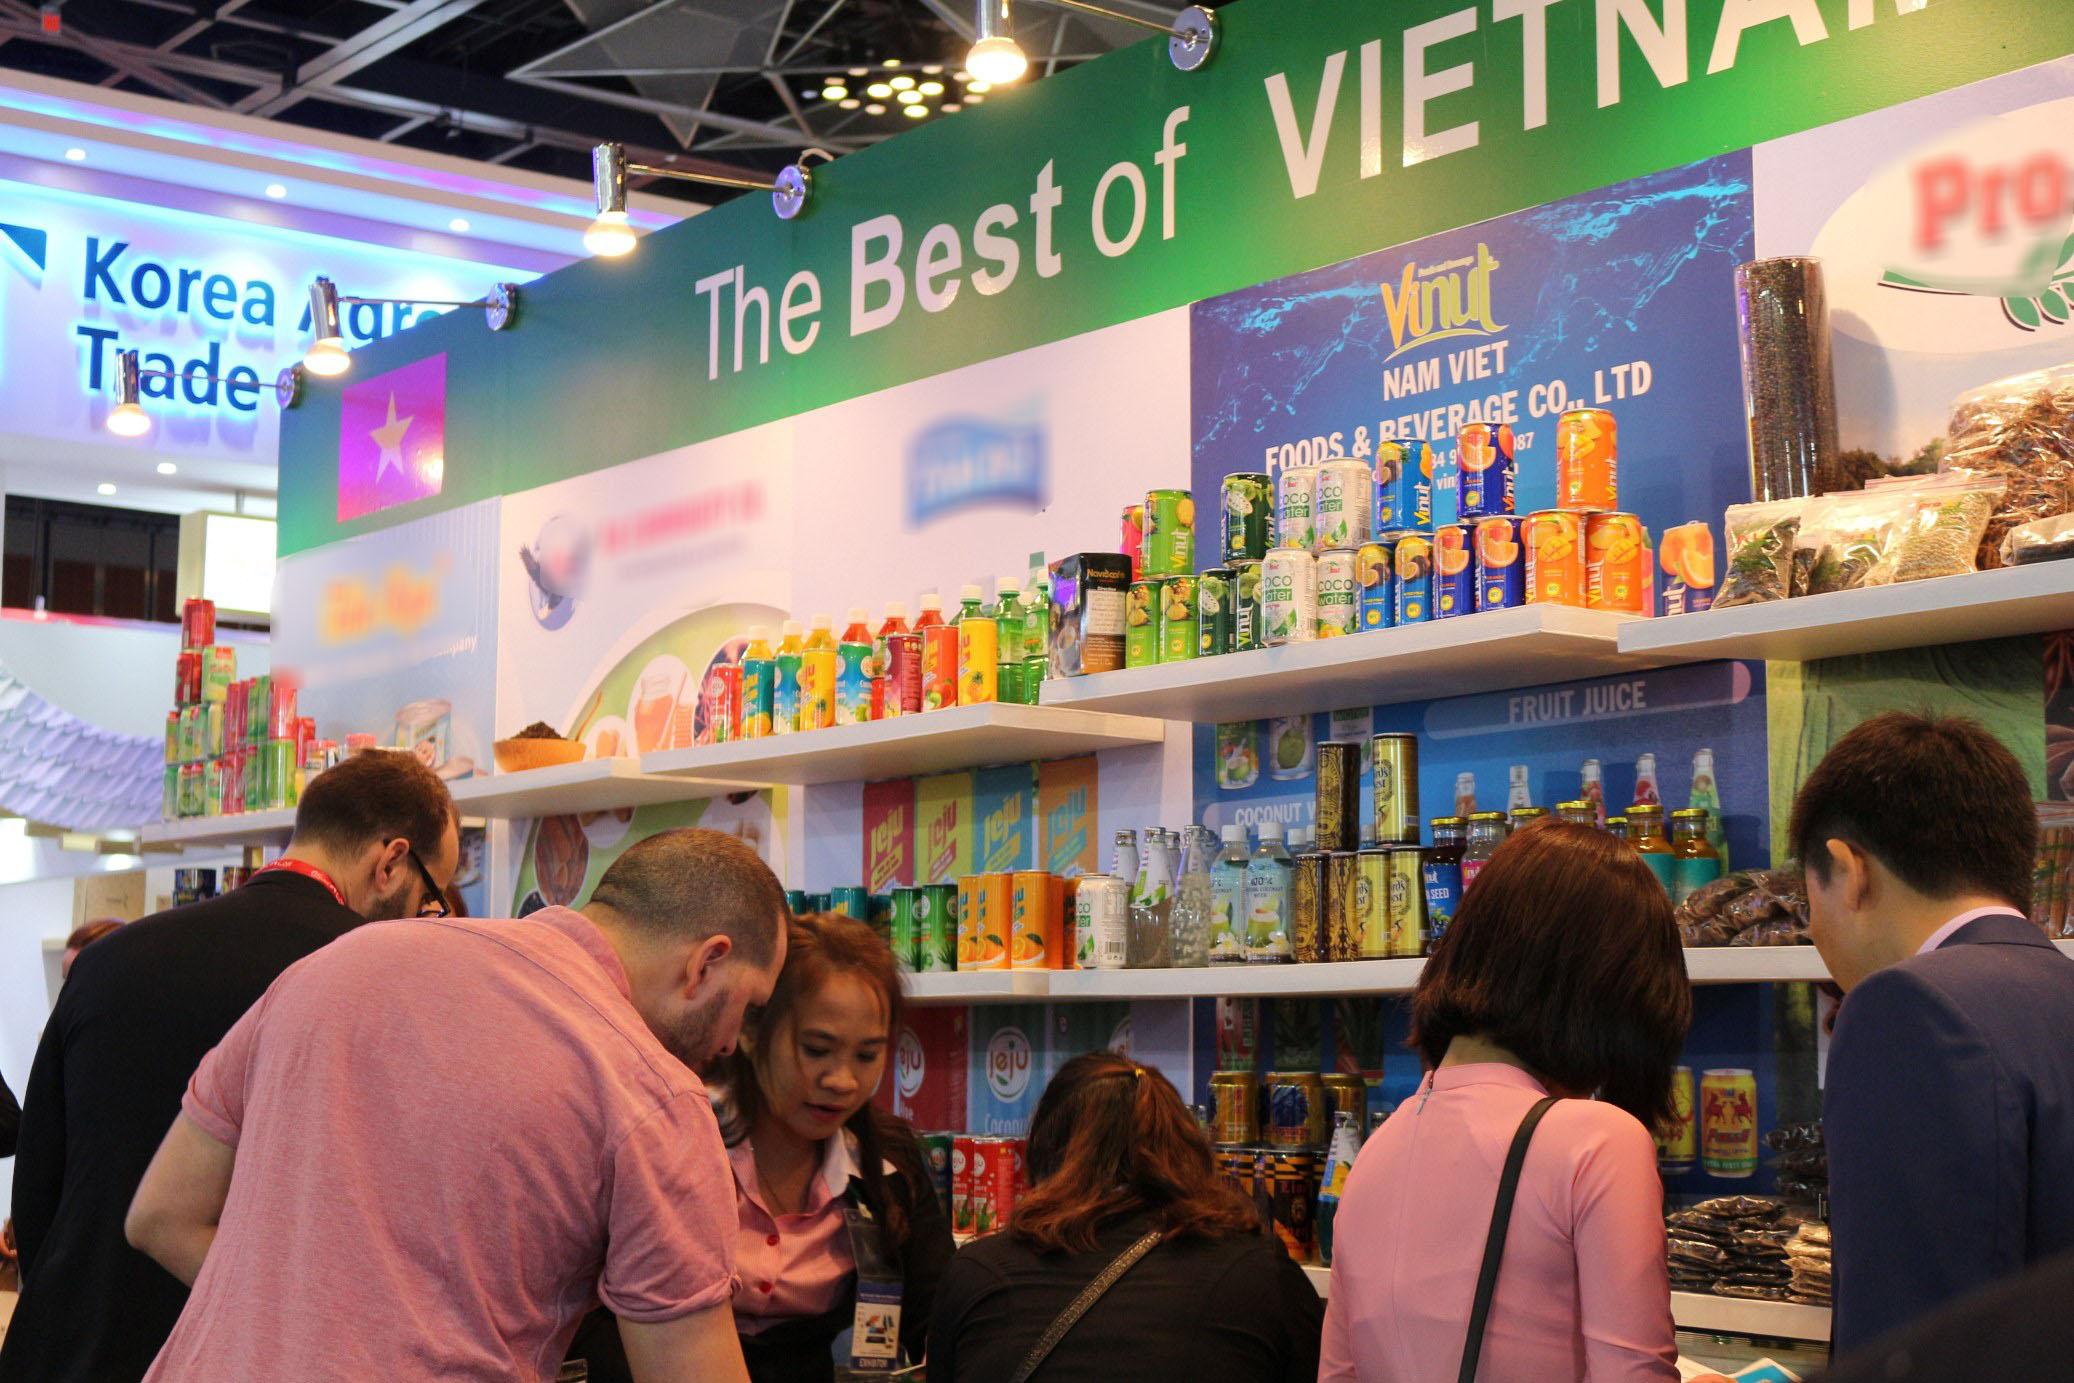 Nam Viet Foods & Beverage Co.,Ltd